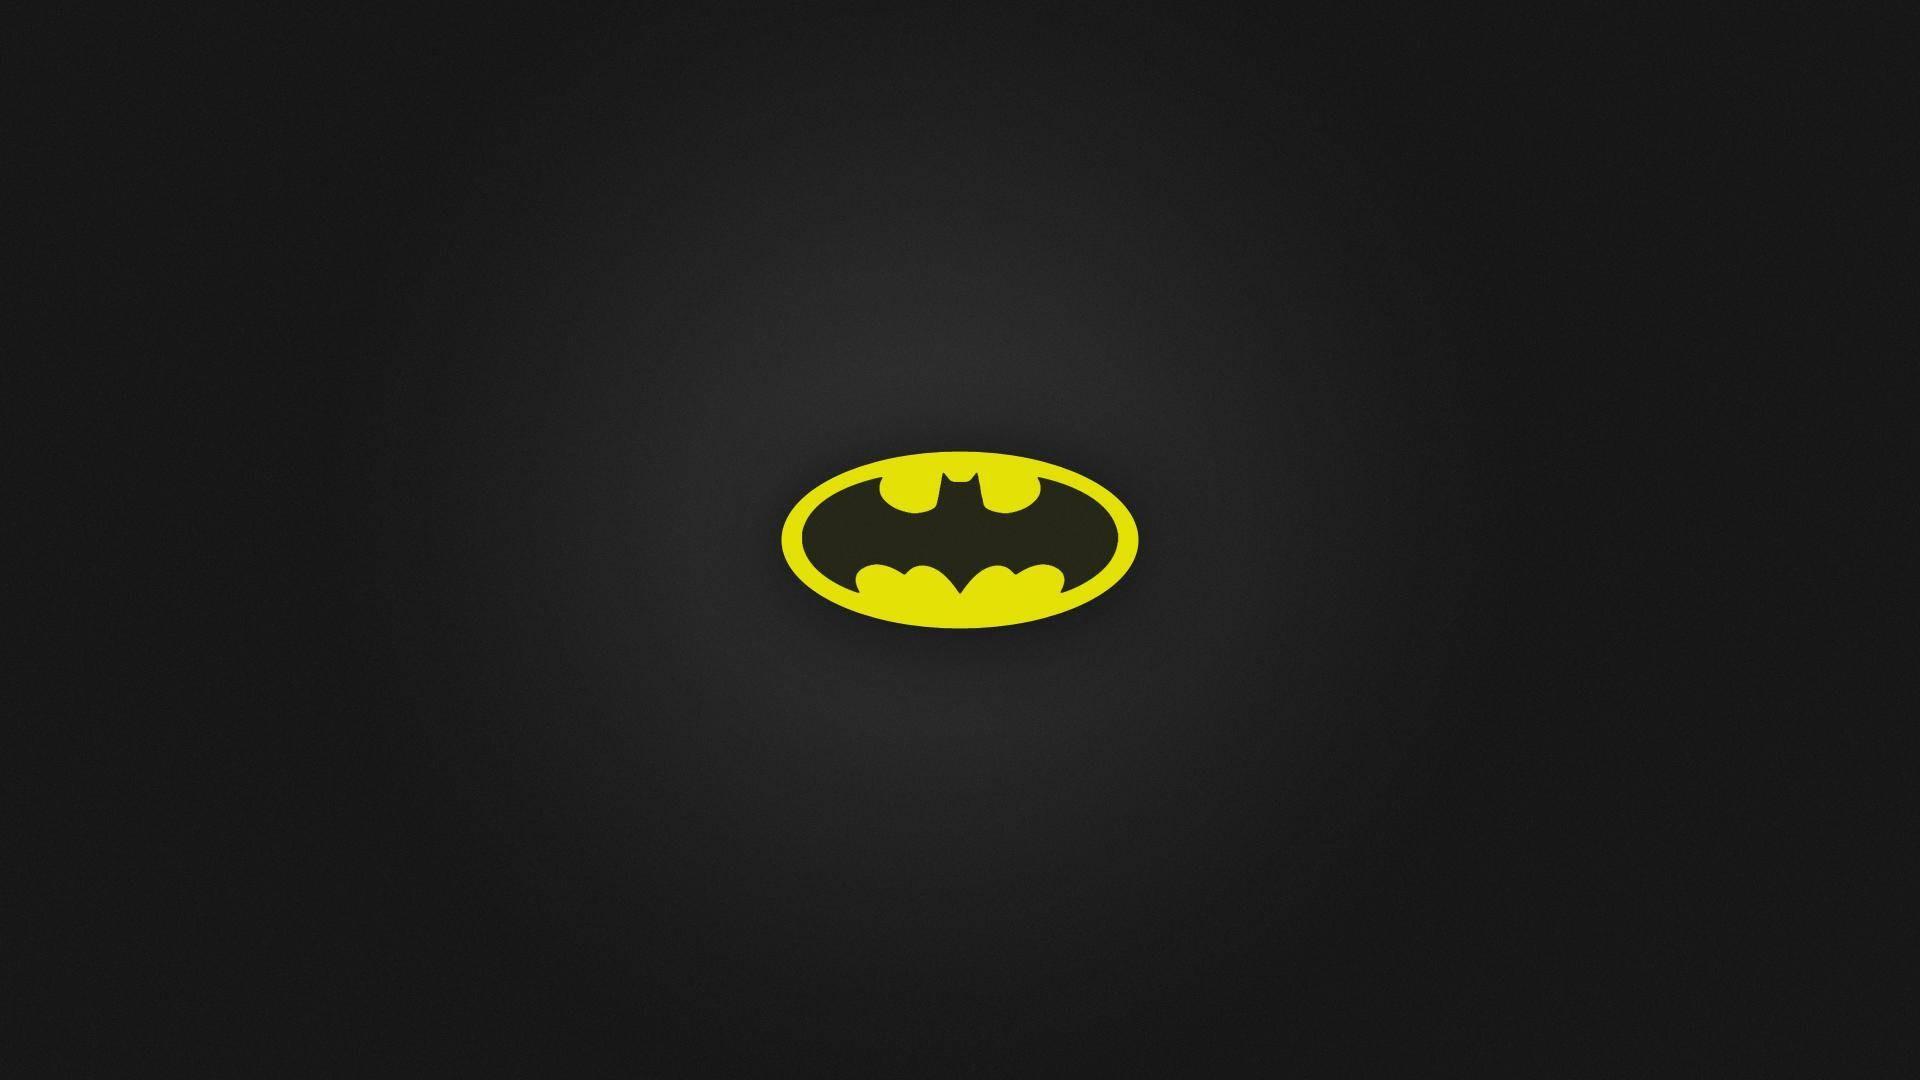 General 1920x1080 Batman logo minimalism simple background